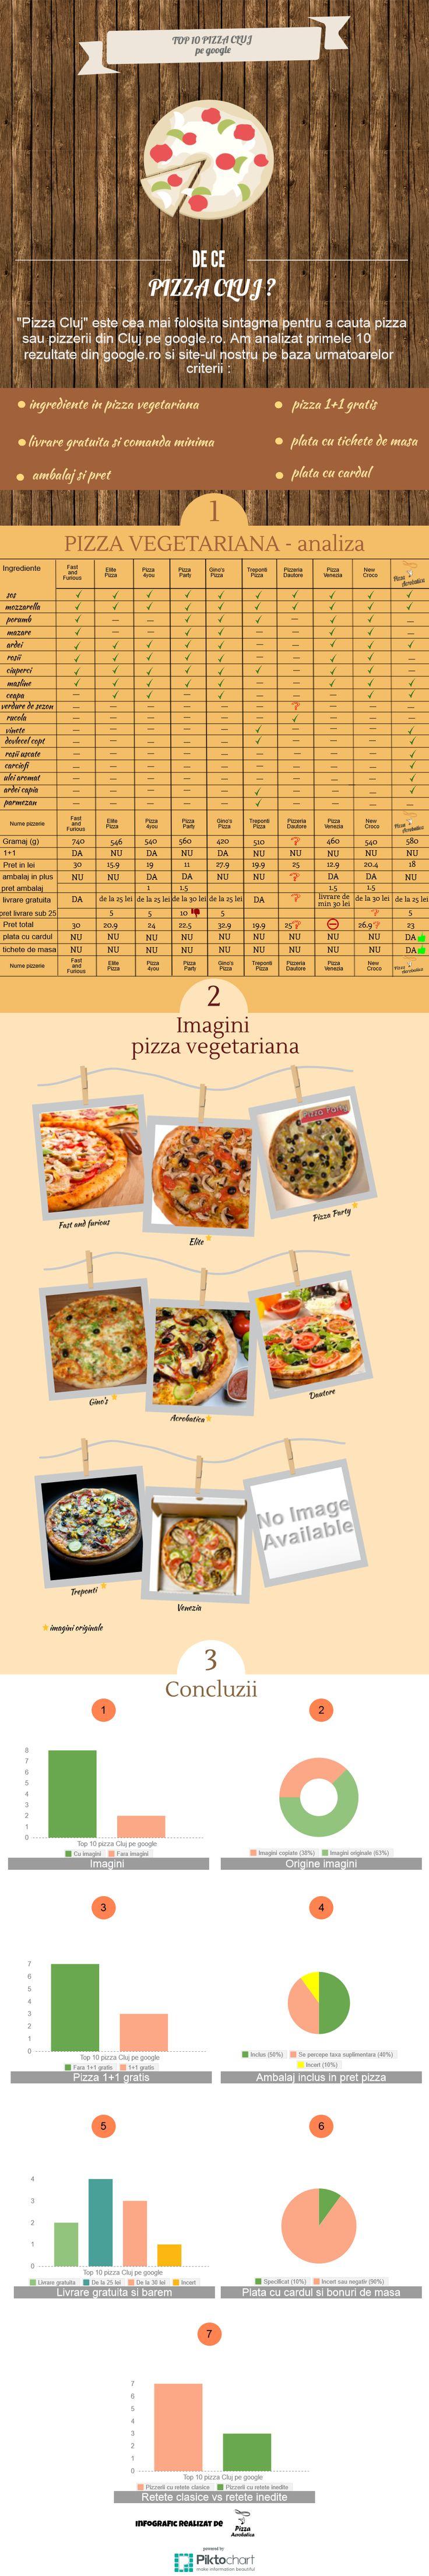 Pizza vegetariana Cluj - infographic